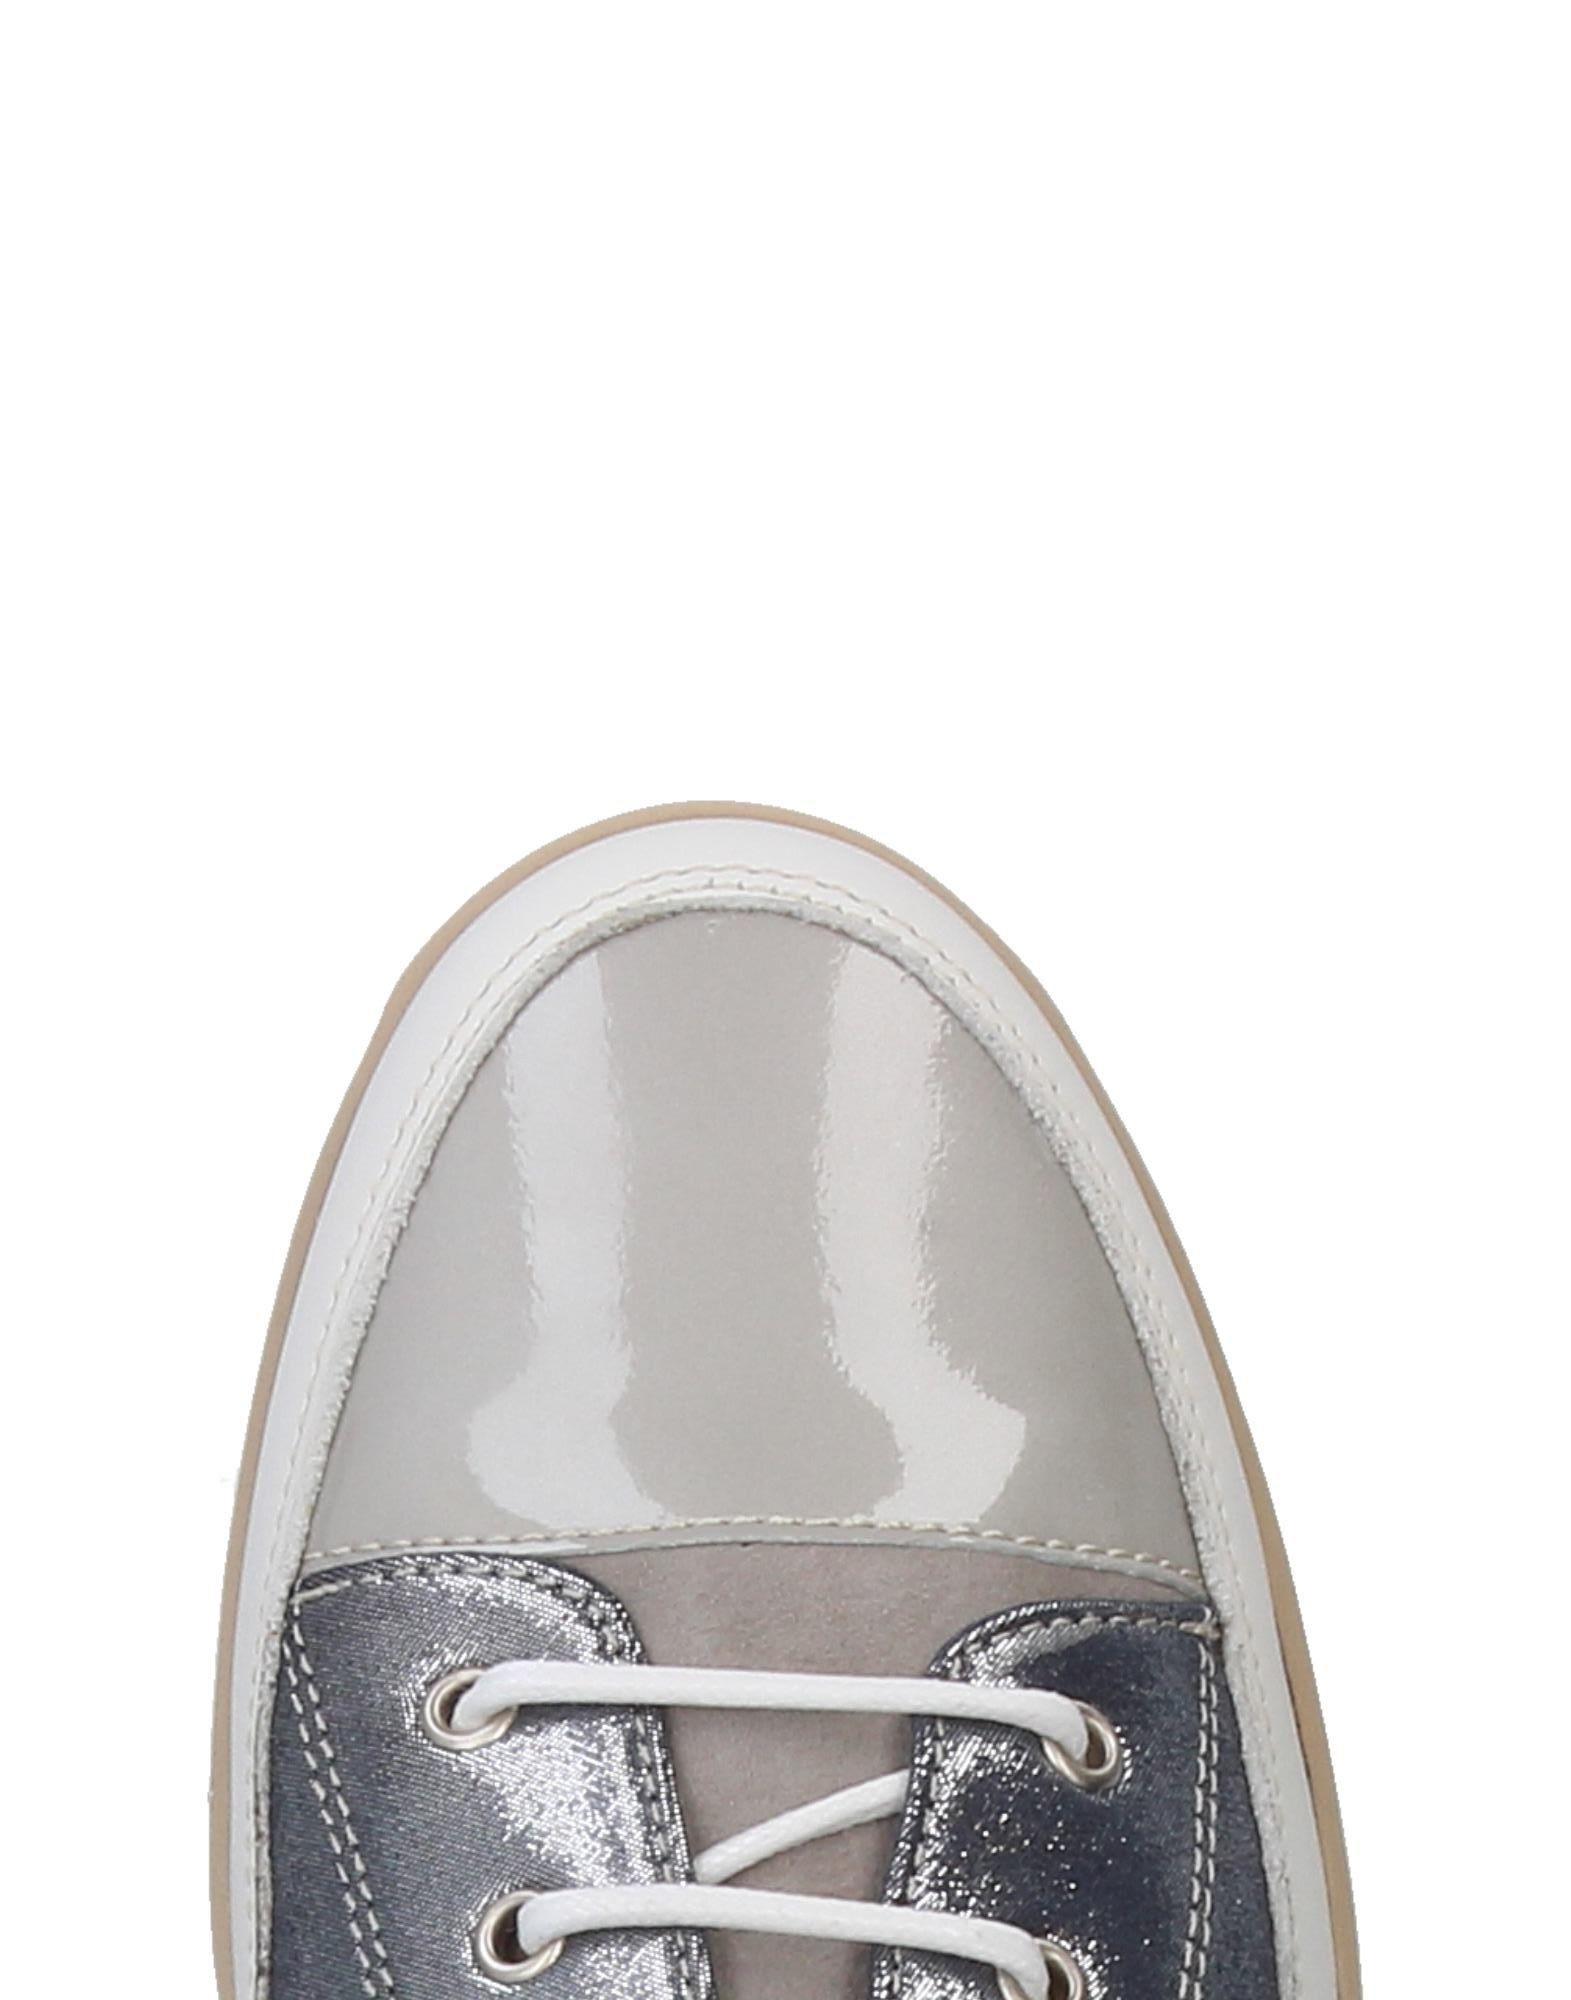 Sneakers Calpierre Femme - Sneakers Calpierre sur